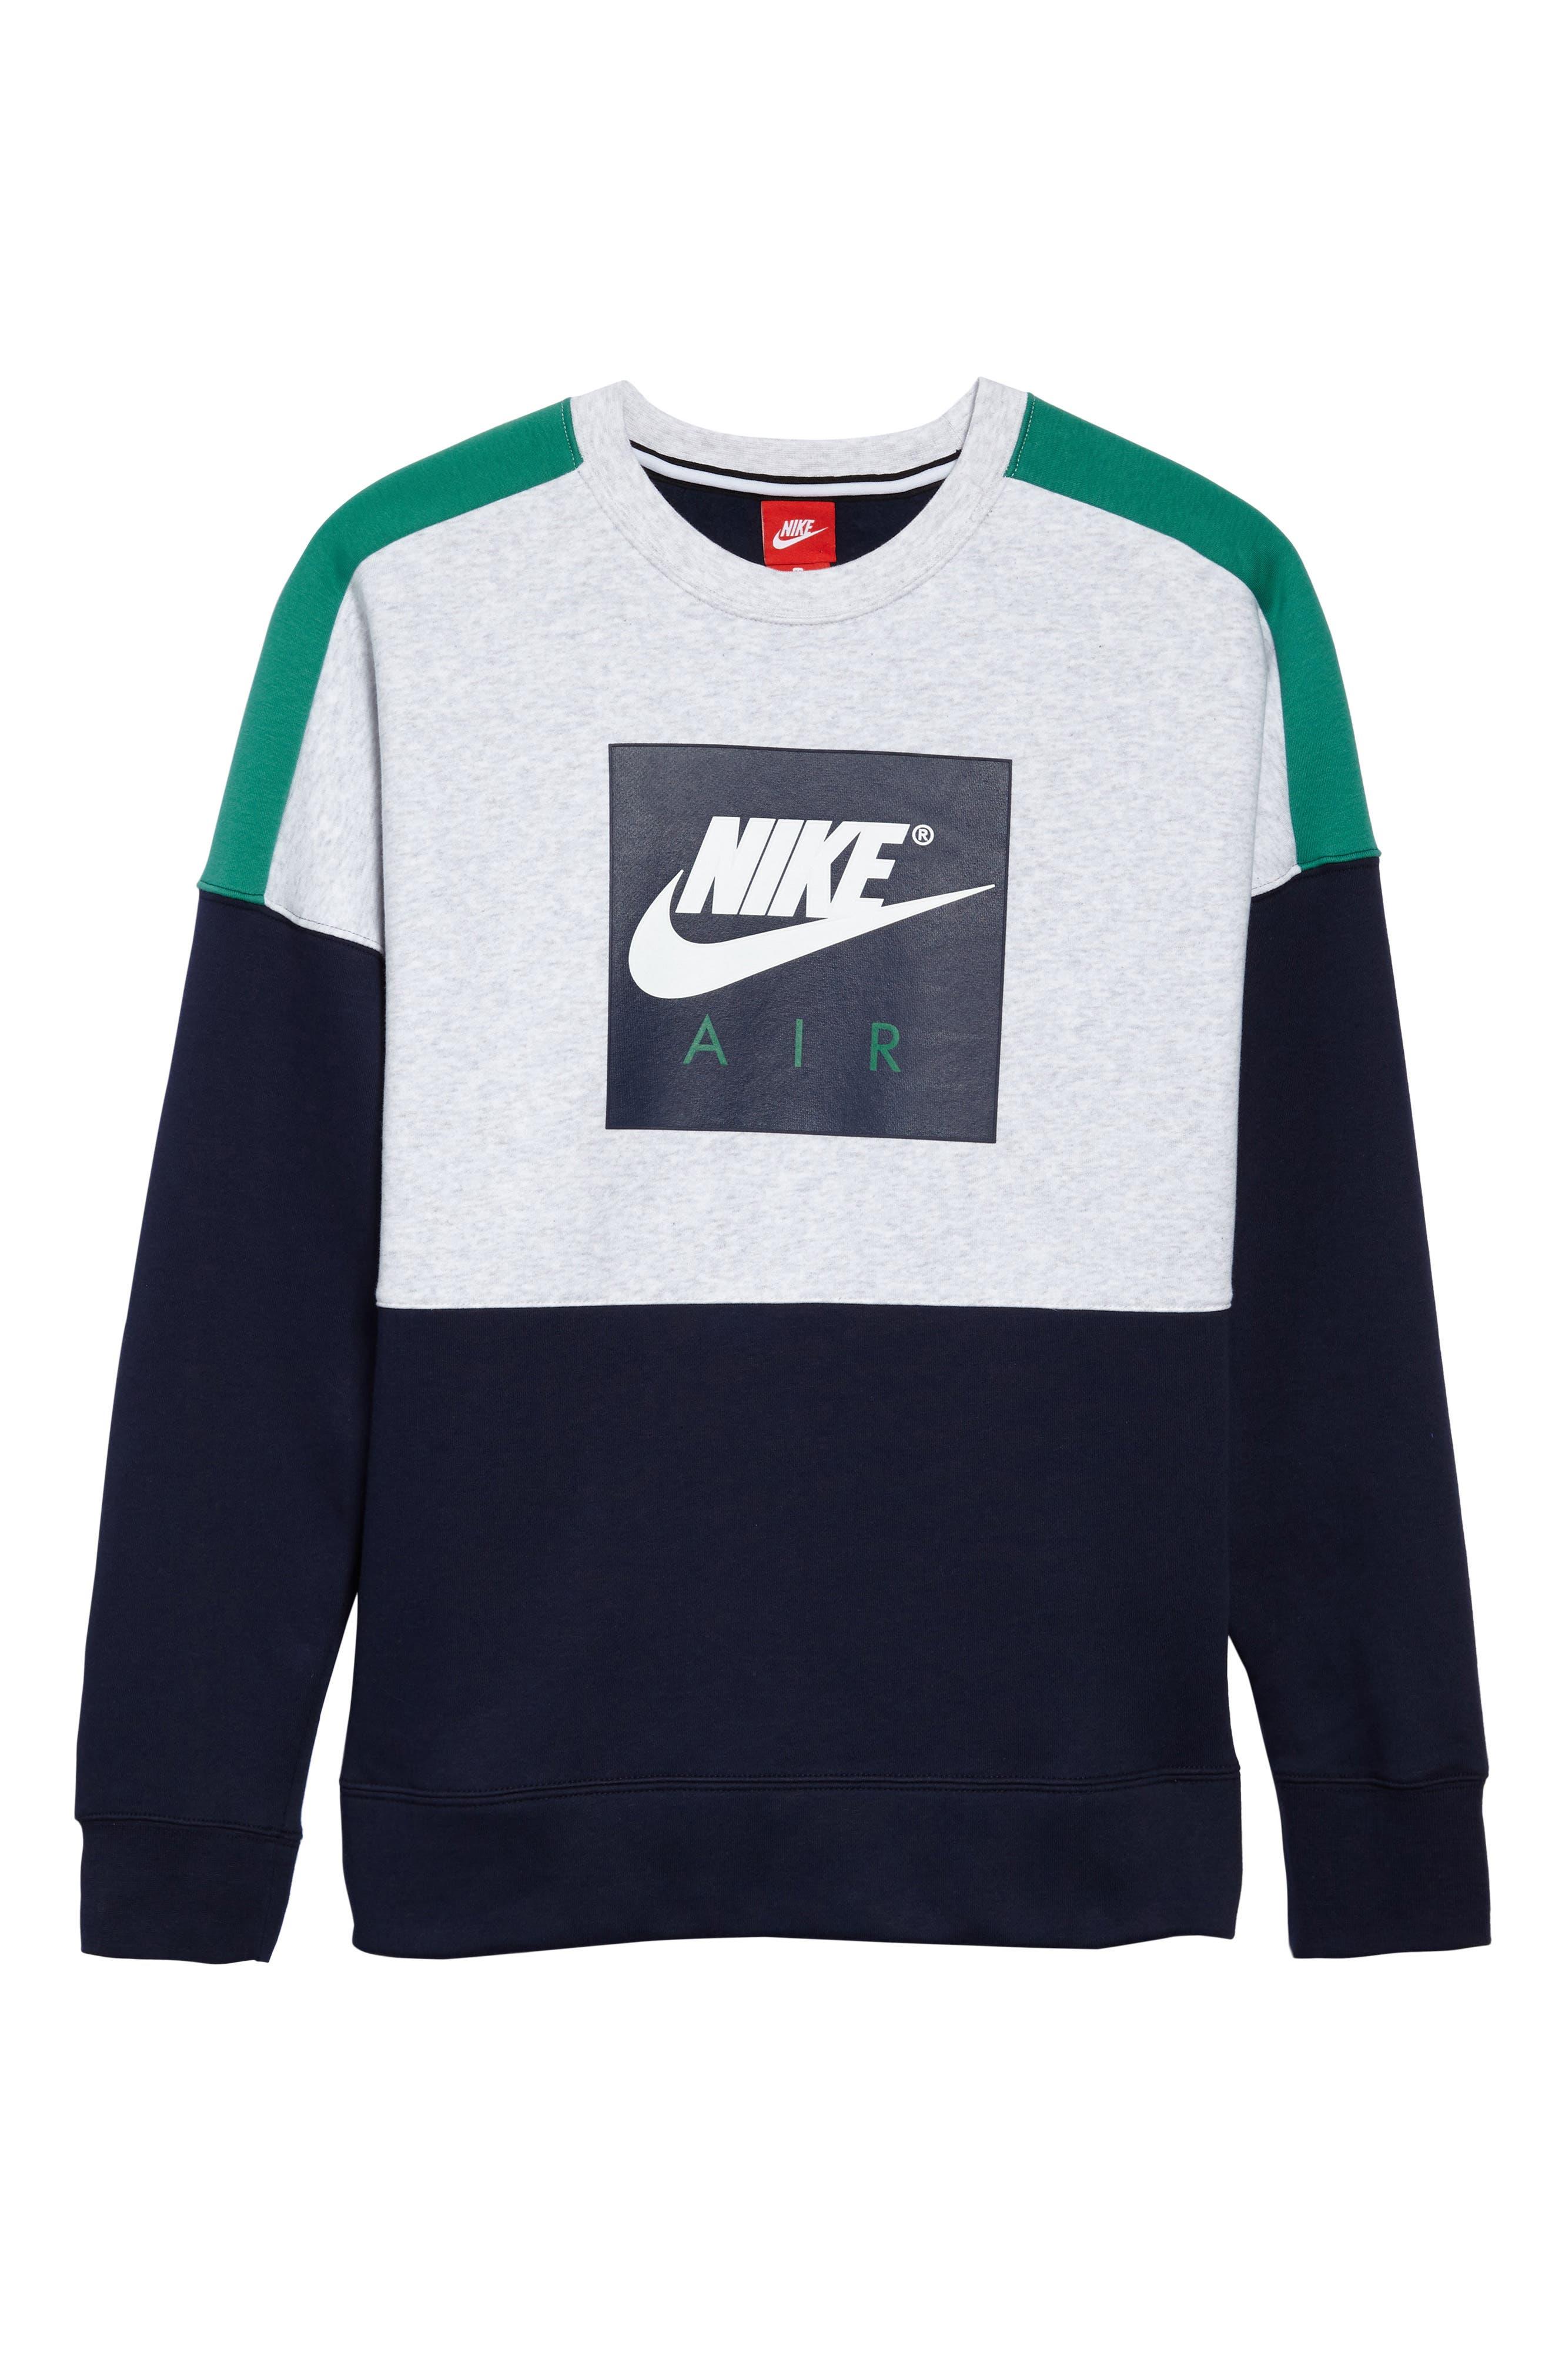 NSW Air Crewneck Sweatshirt,                             Alternate thumbnail 6, color,                             Birch/ Green/ Obsidian/ White